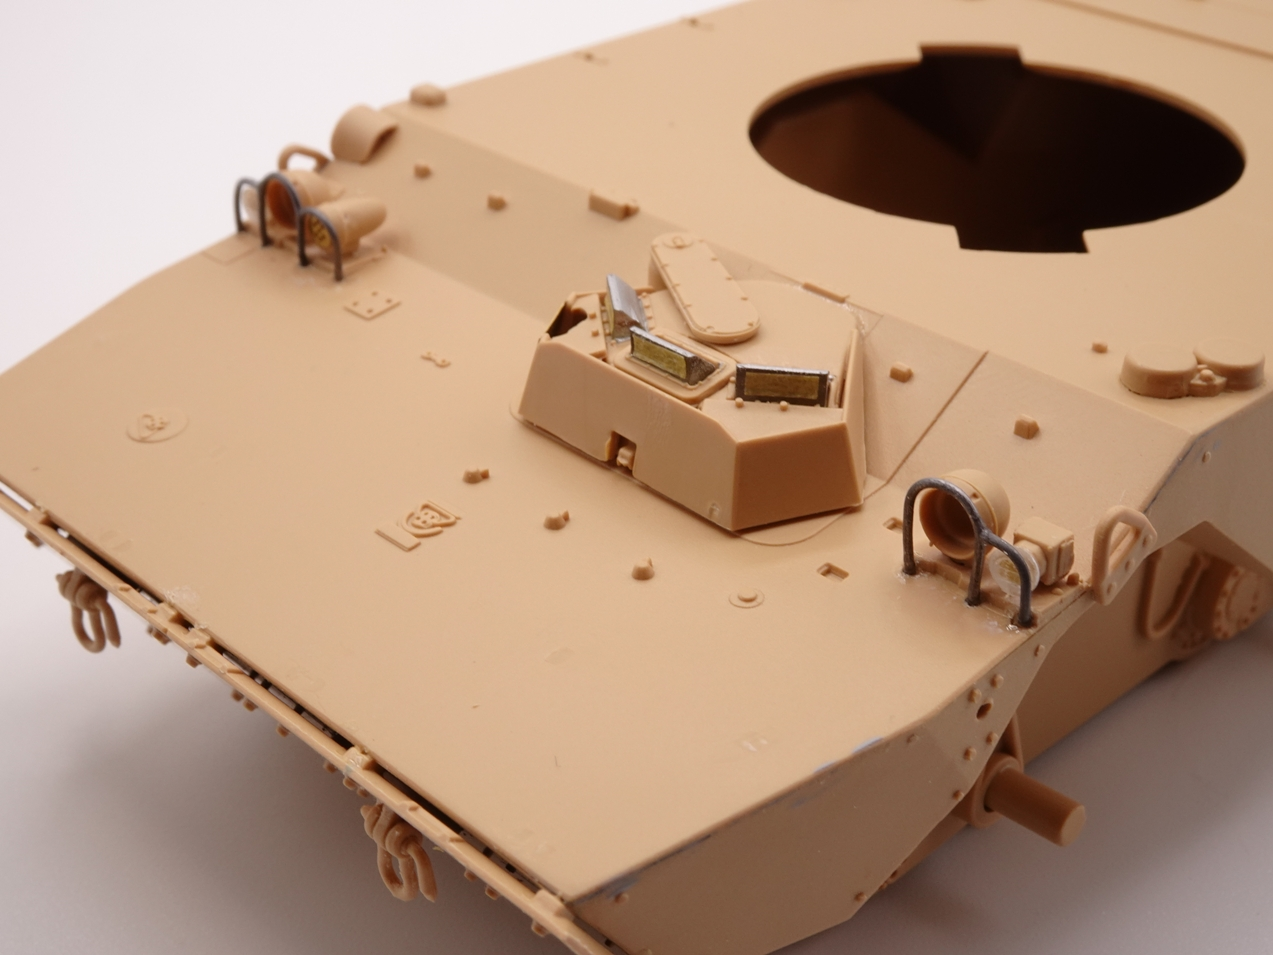 [Tiger Model] AMX-10RCR réf. 4602 - 1/35 - Page 2 Amx10-1407-2